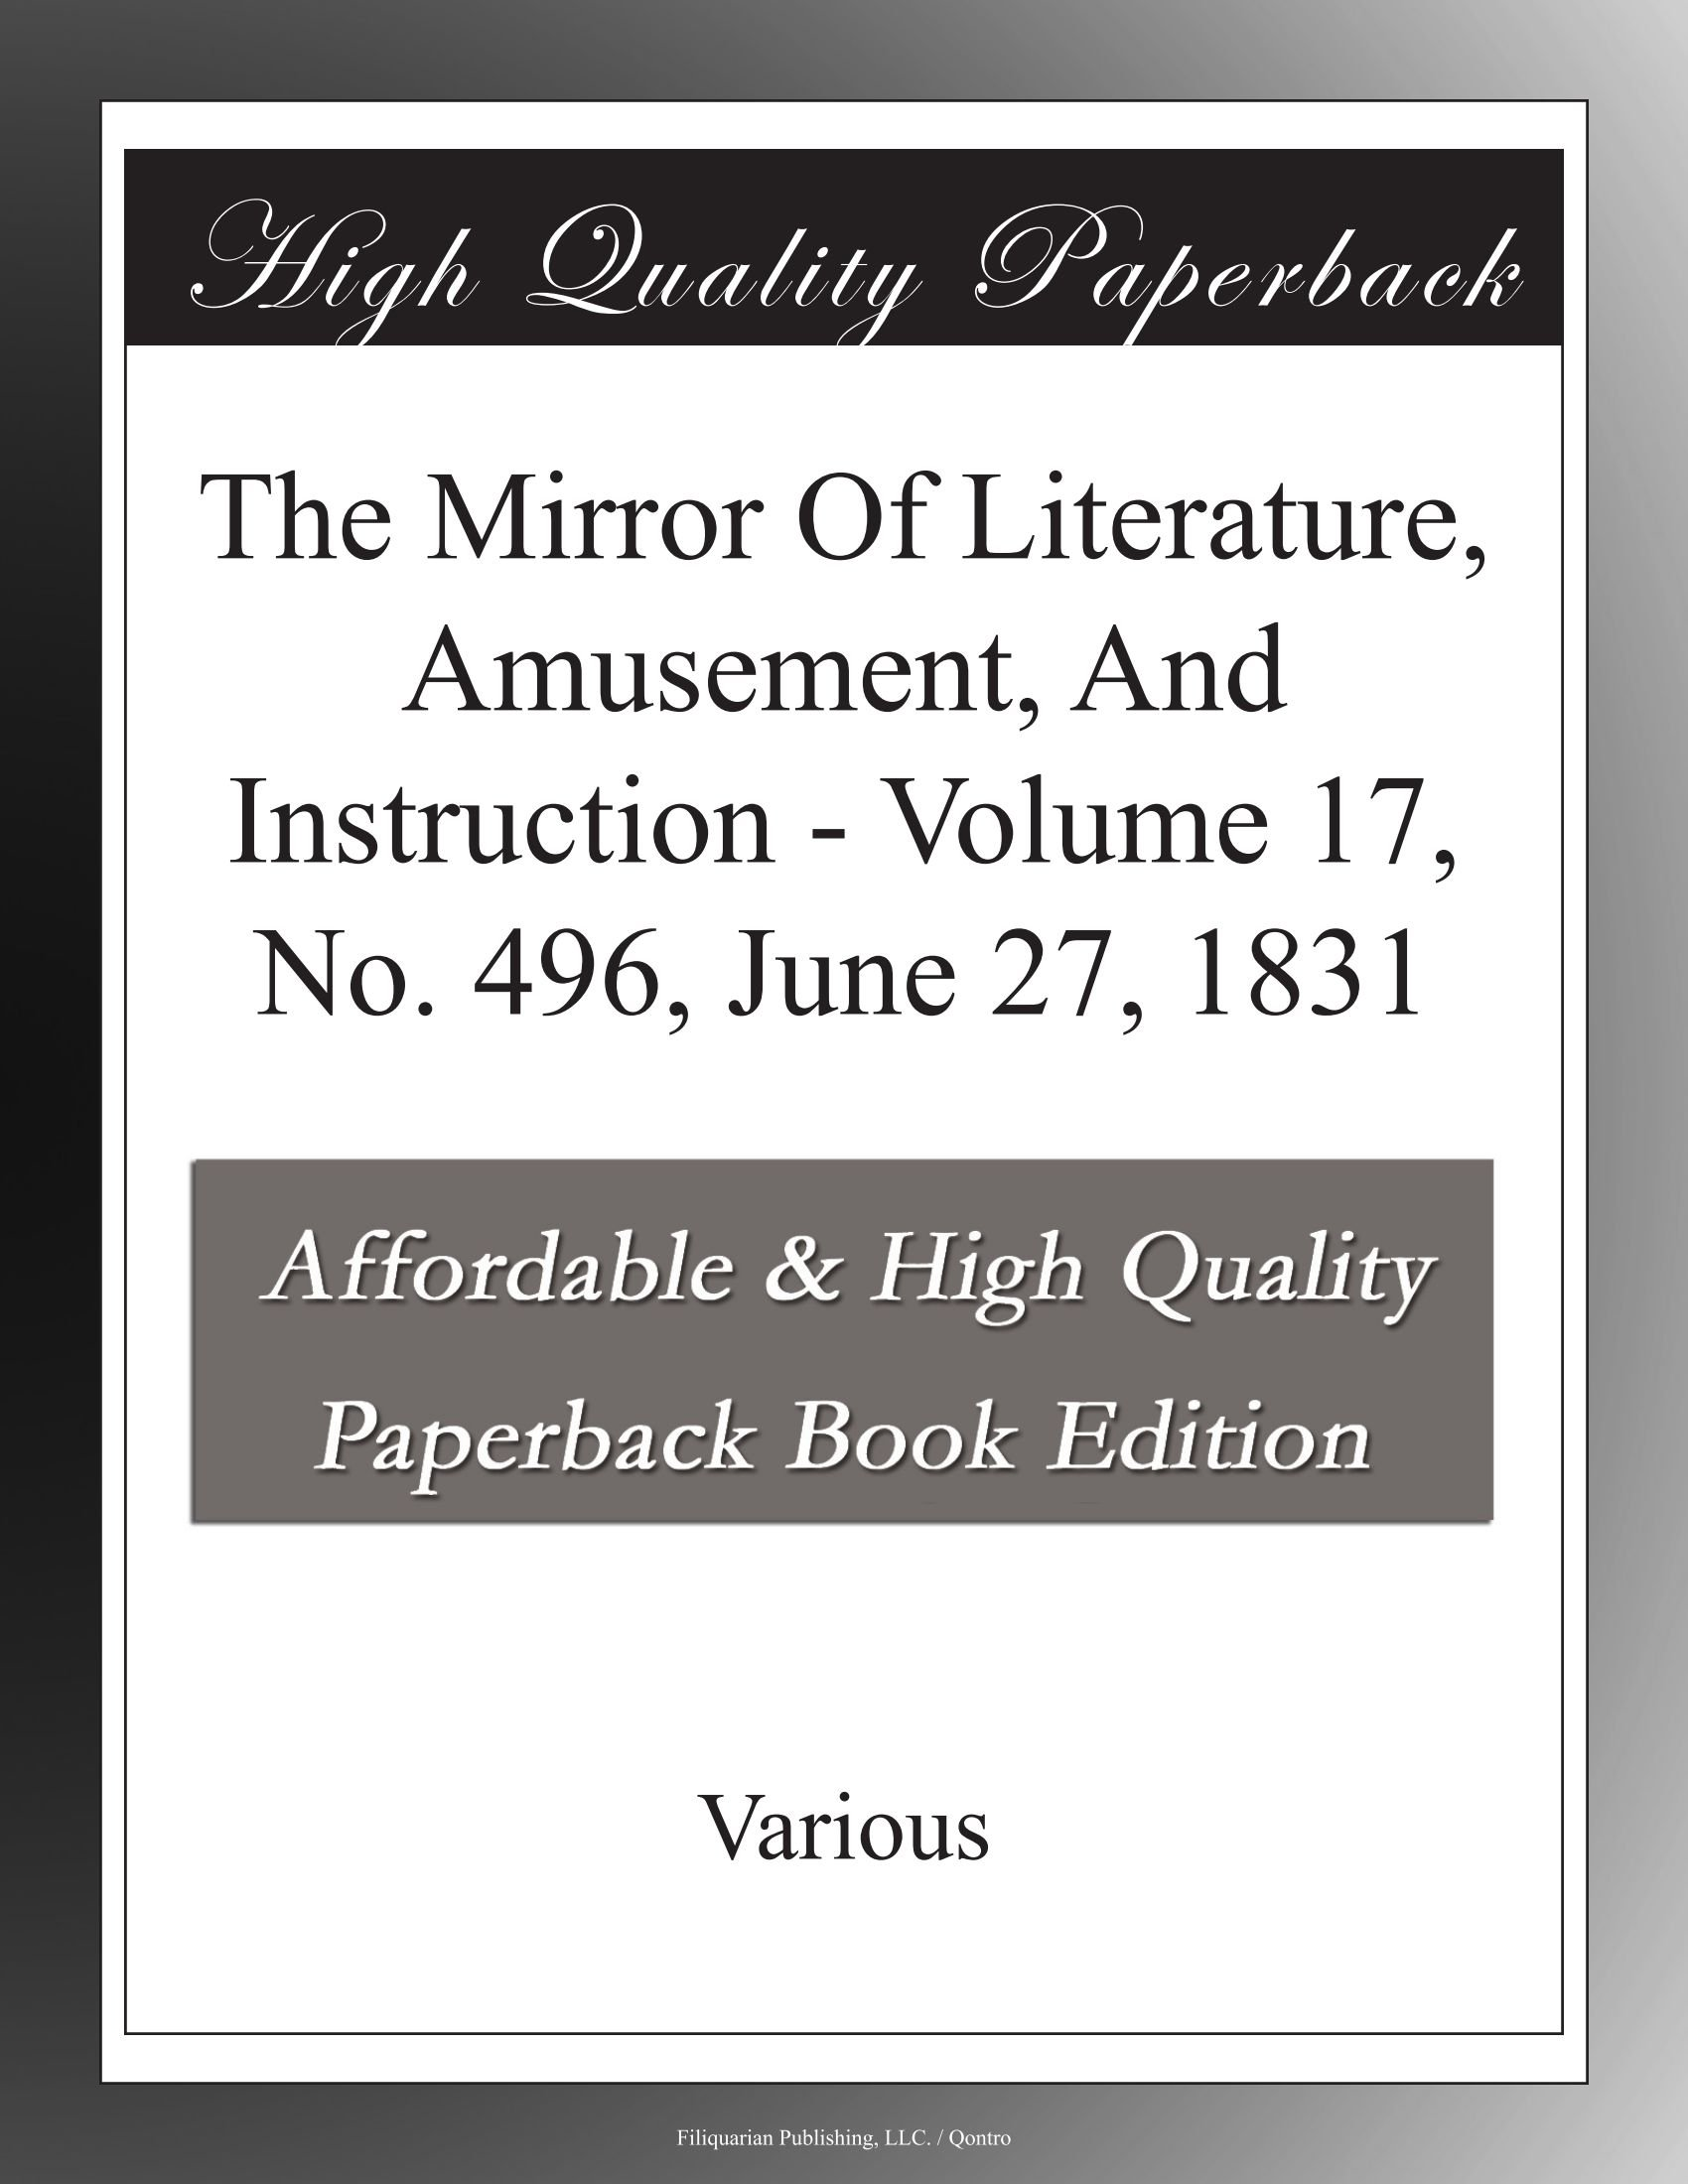 The Mirror Of Literature, Amusement, And Instruction - Volume 17, No. 496, June 27, 1831 pdf epub